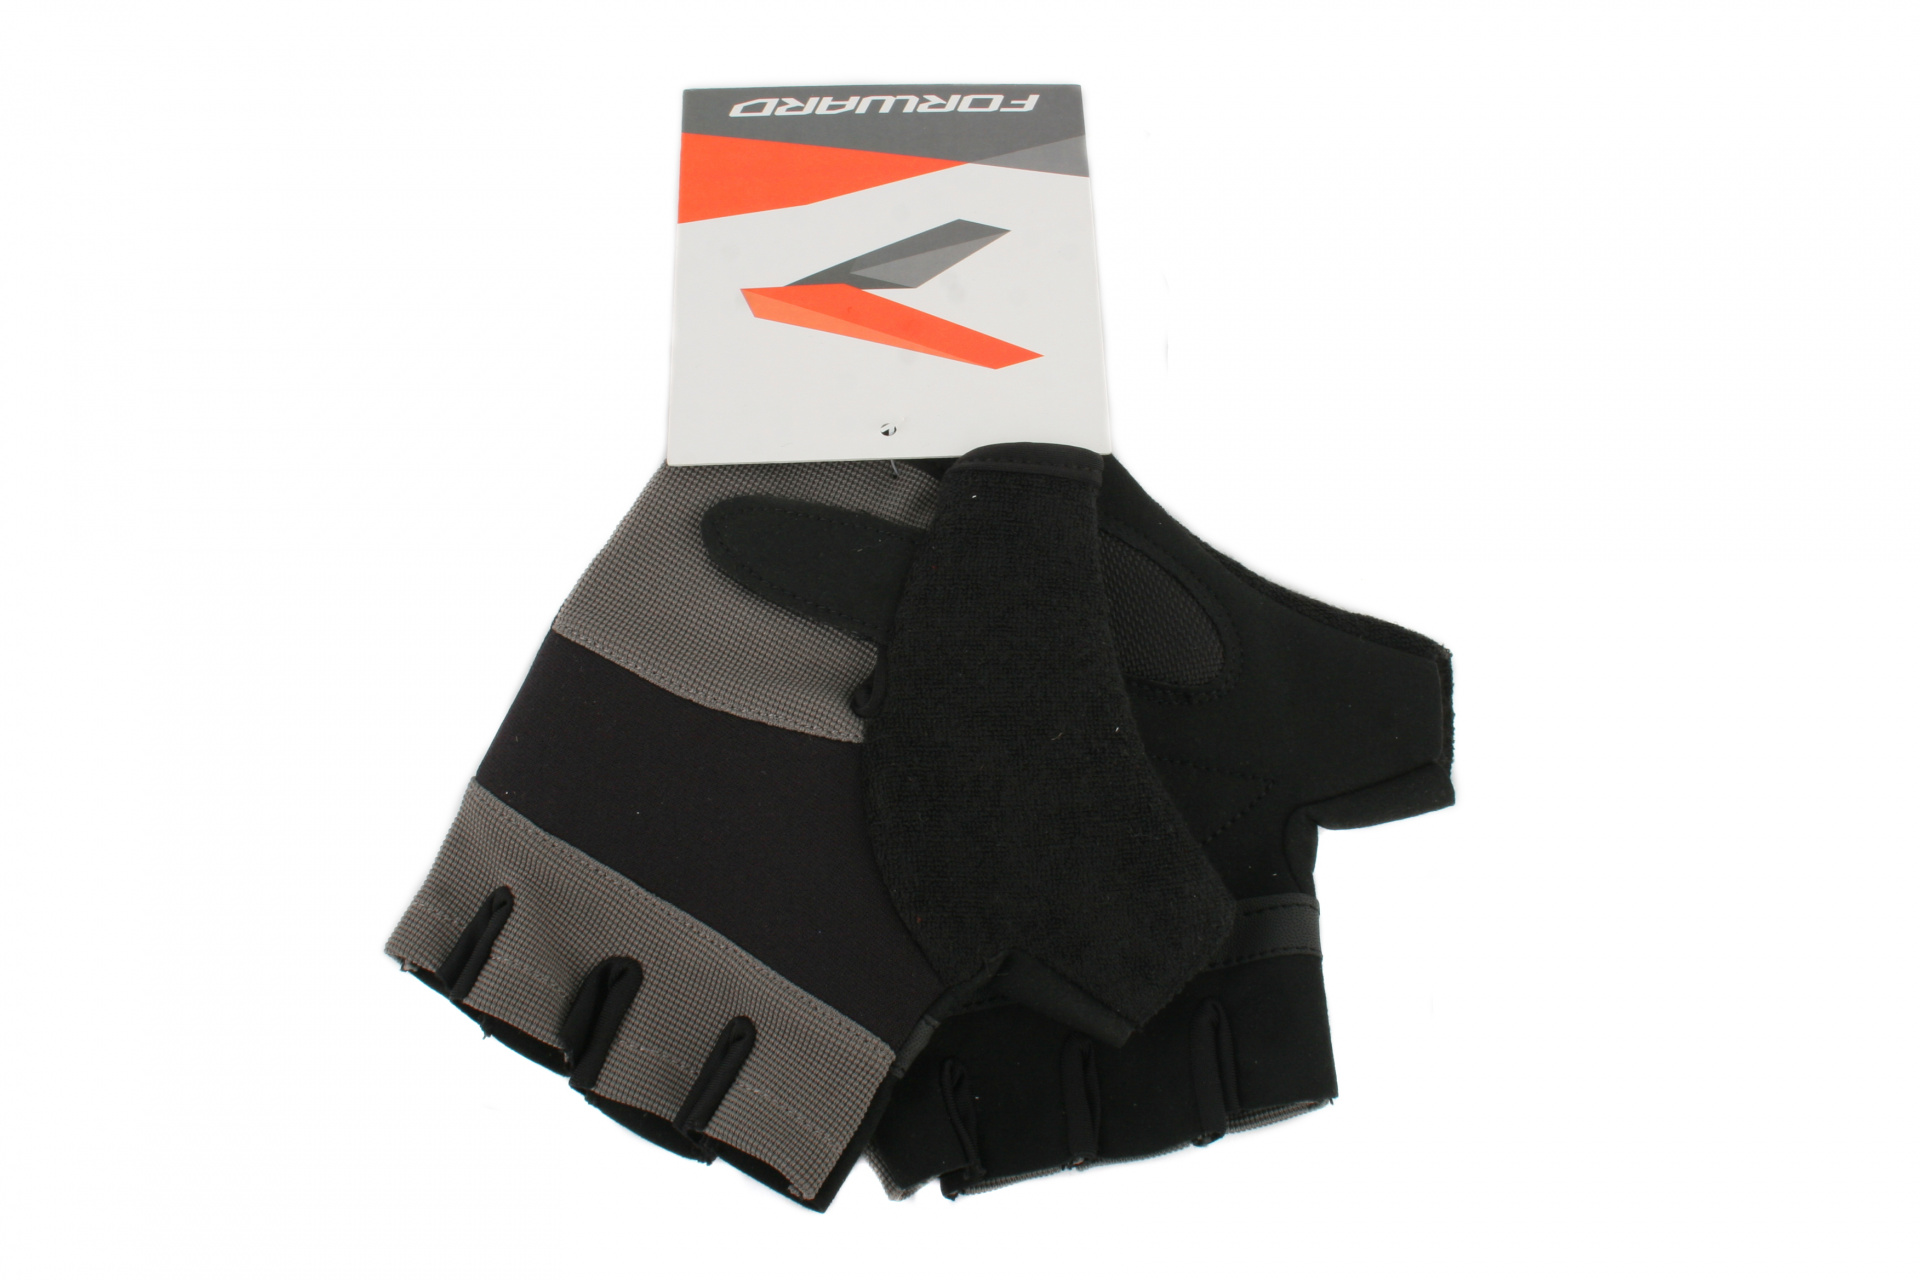 Перчатки, BI16003, M, короткий палец, SAIGUAN, черный, серый, RGSBI1600301 фото